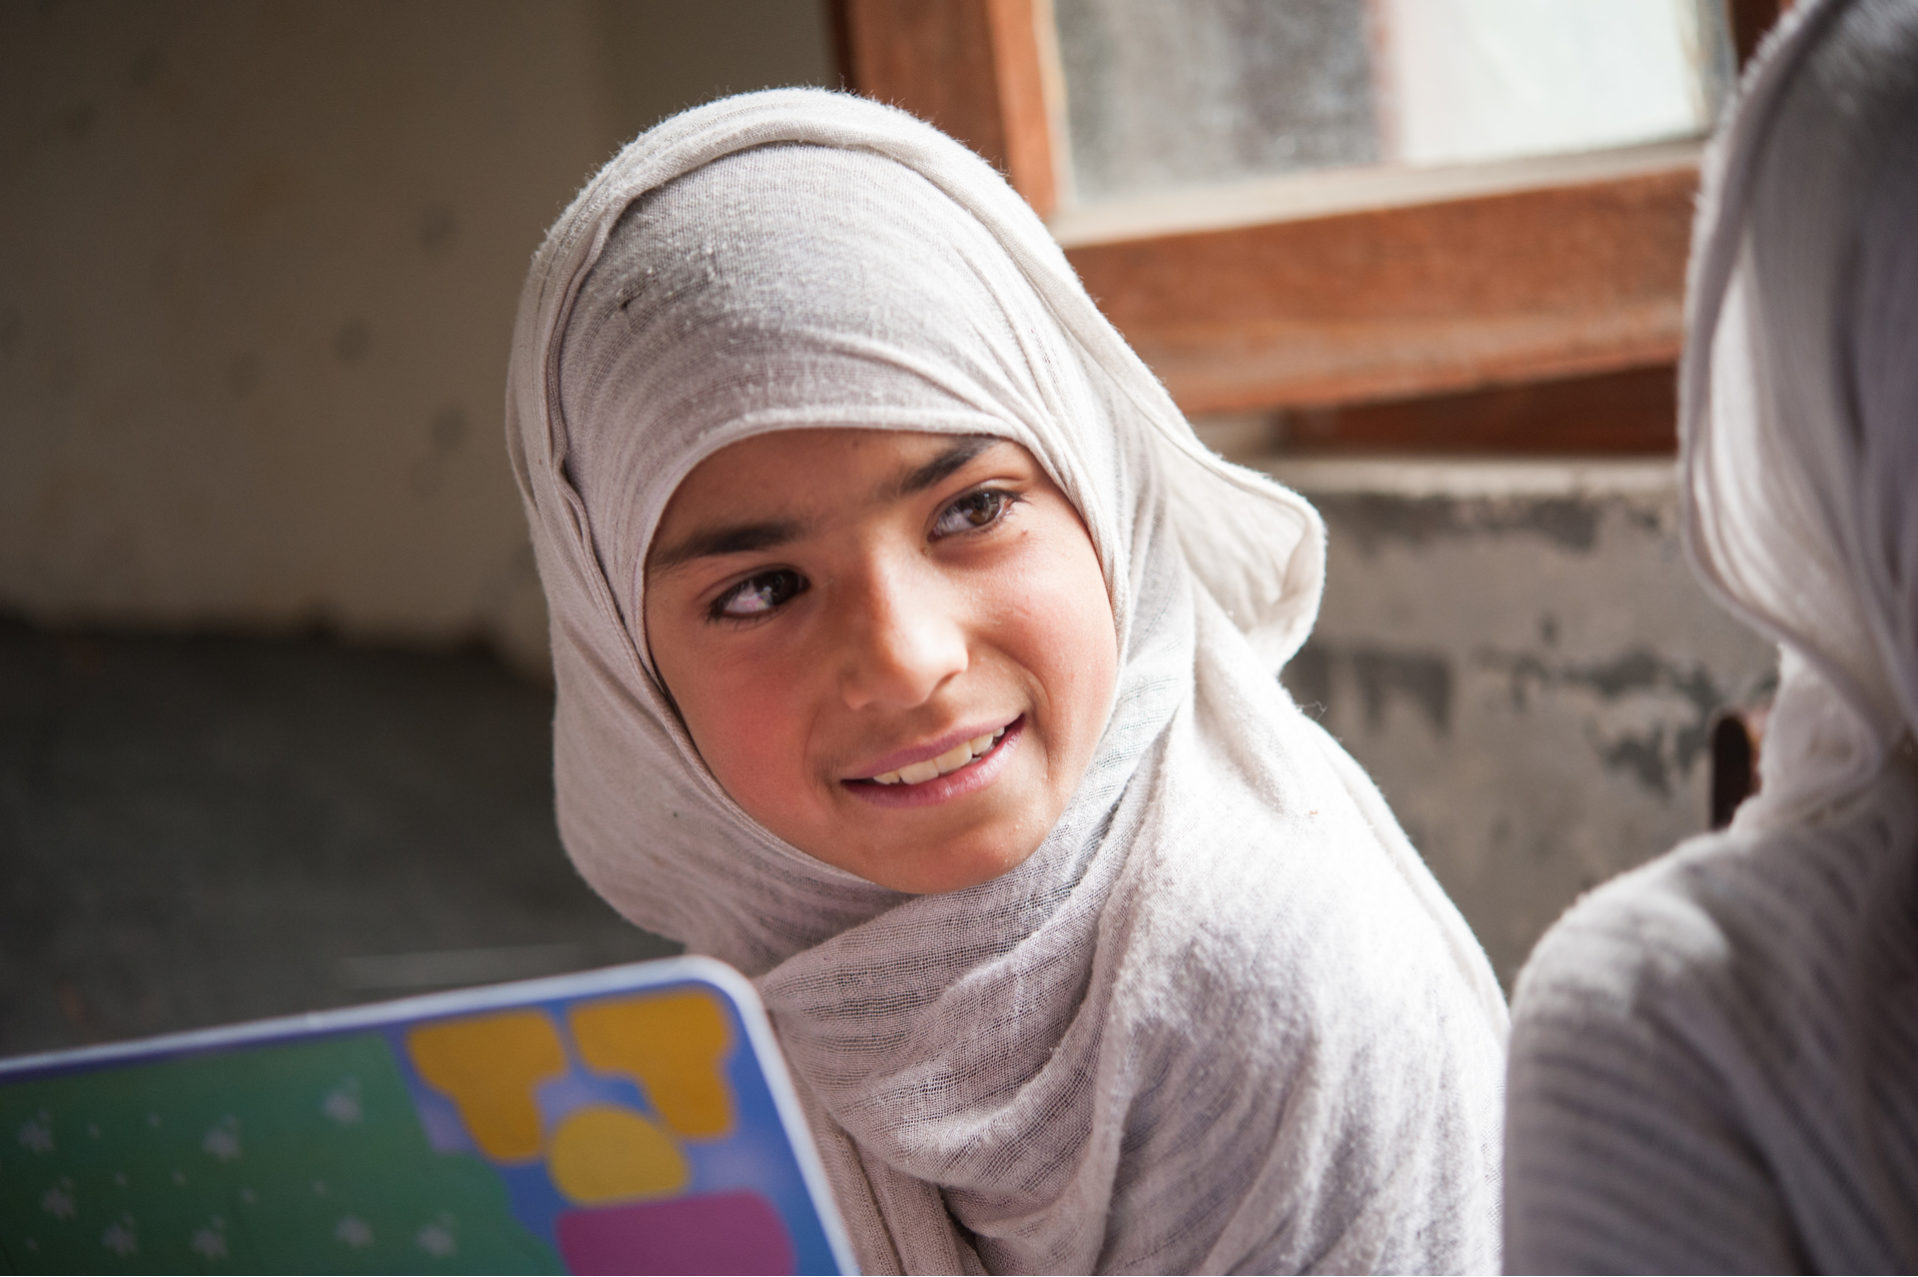 Taleemabad: The app spreading education across Pakistan